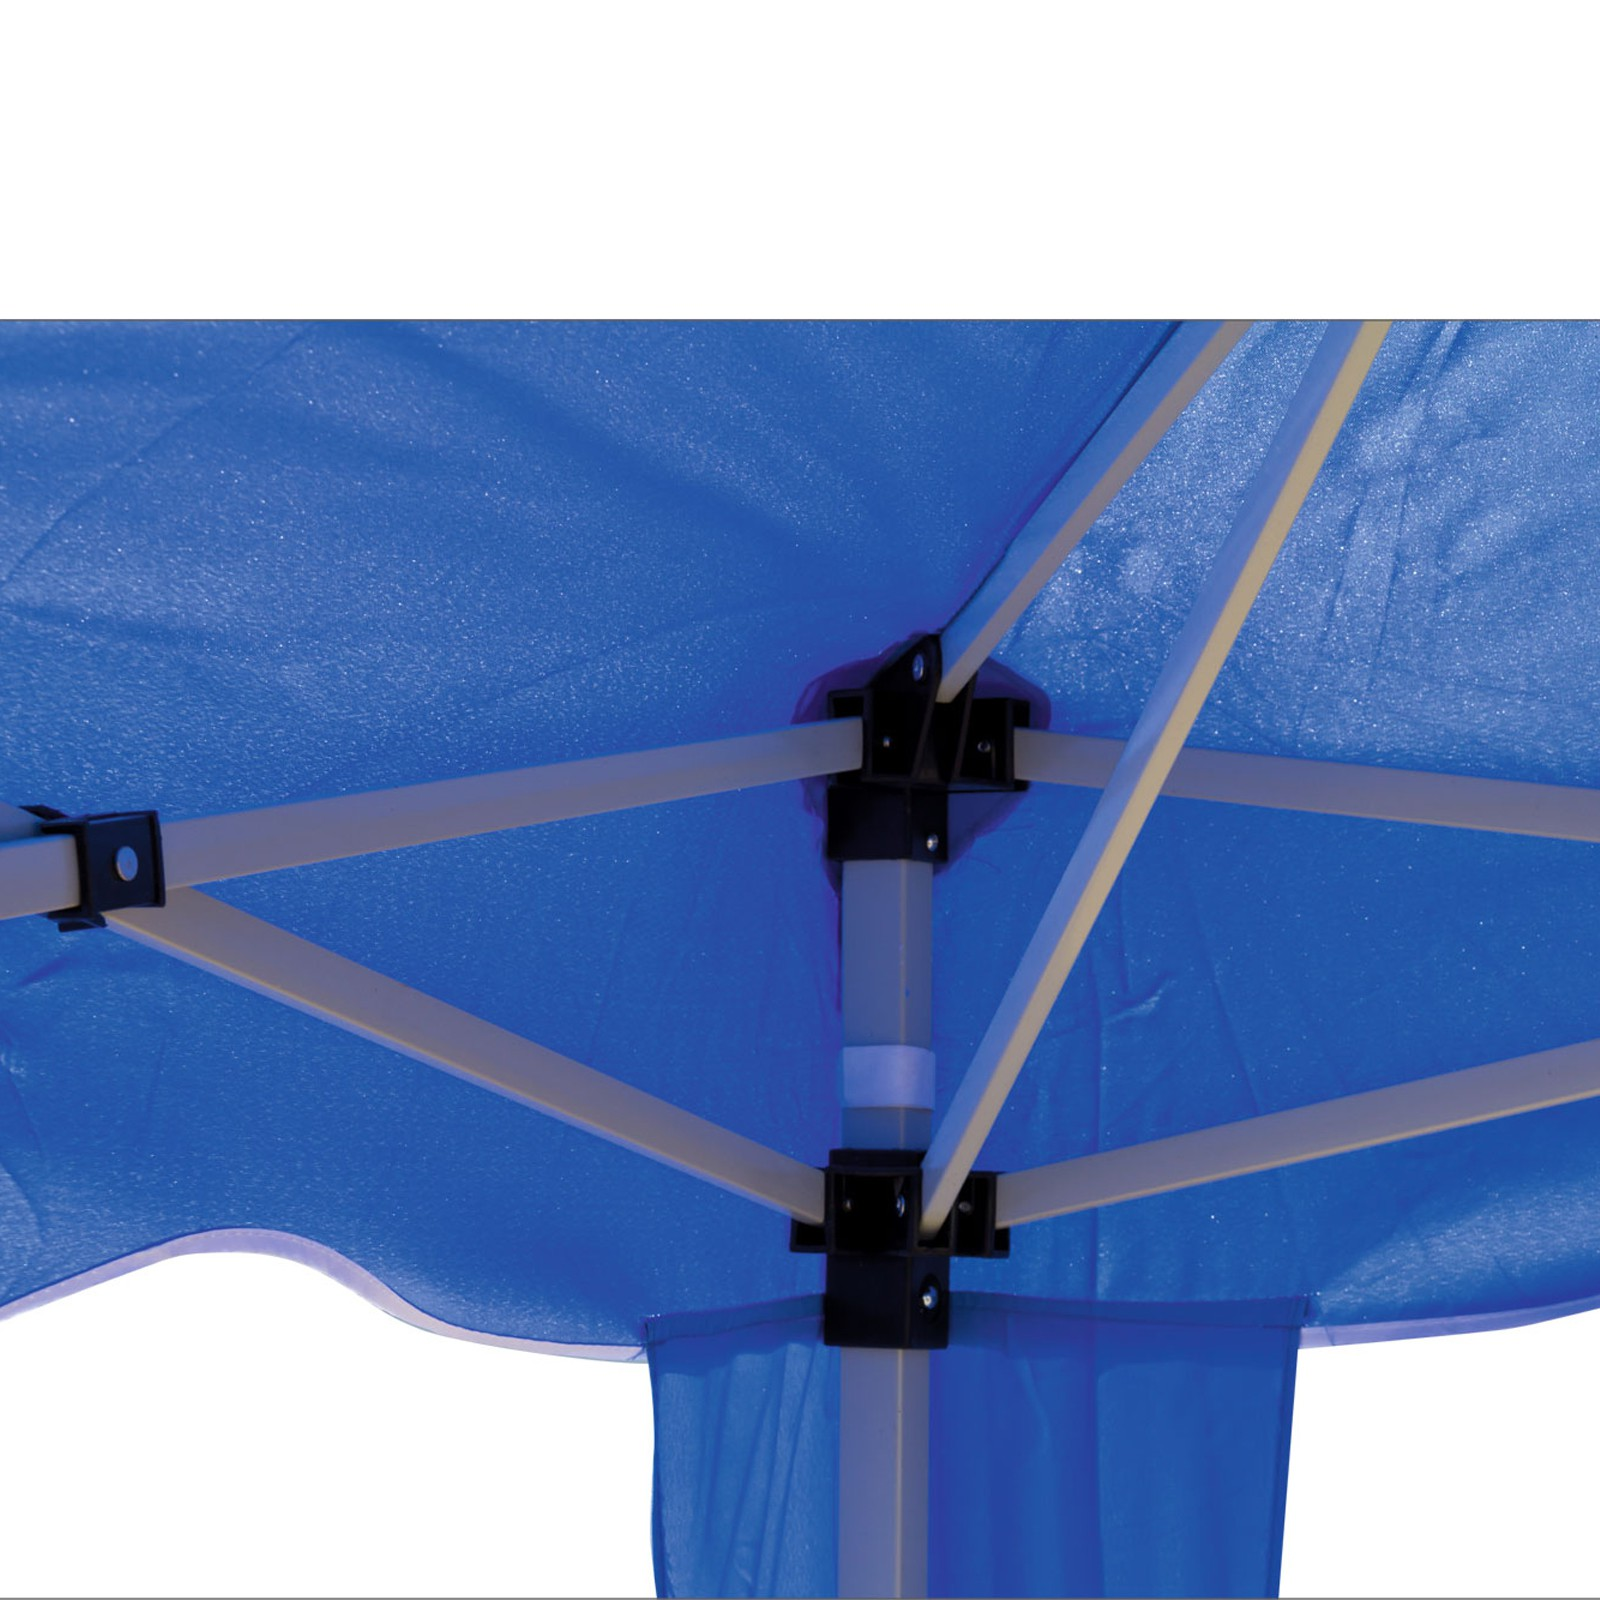 gartenpavillon faltpavillon alu metall 3x3 meter hellblau. Black Bedroom Furniture Sets. Home Design Ideas